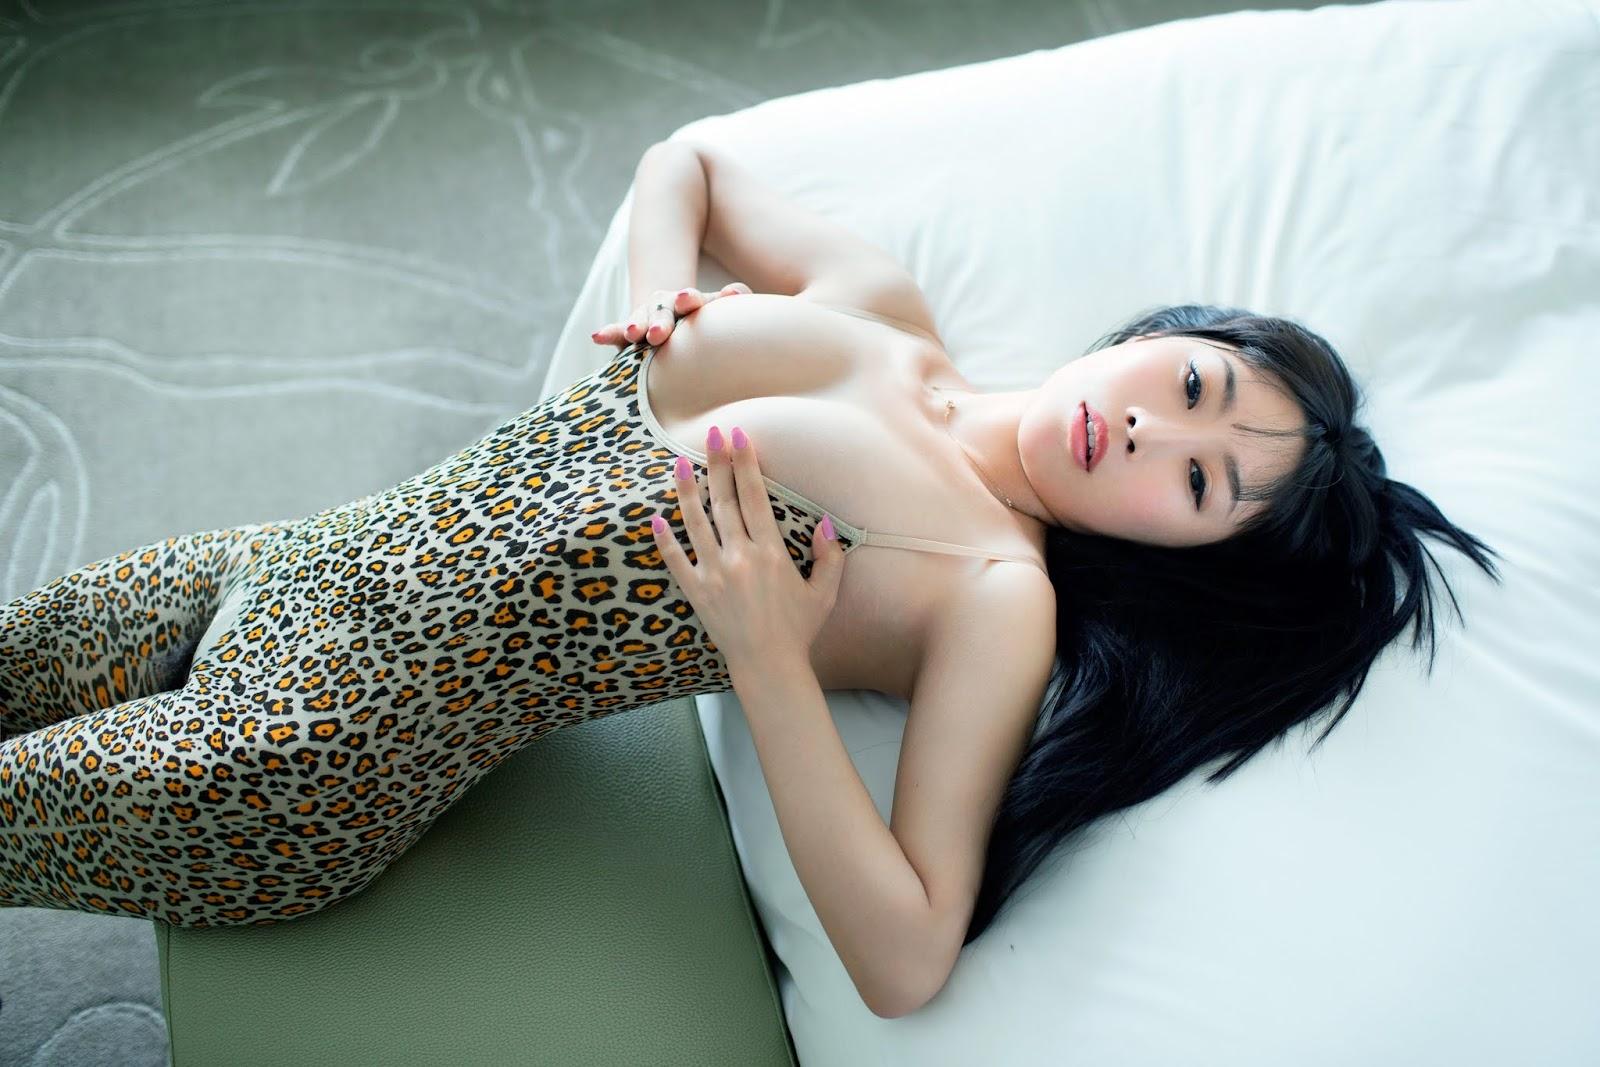 Rita 02 - Hot Model Sexy TUIGIRL NO.50 Naked